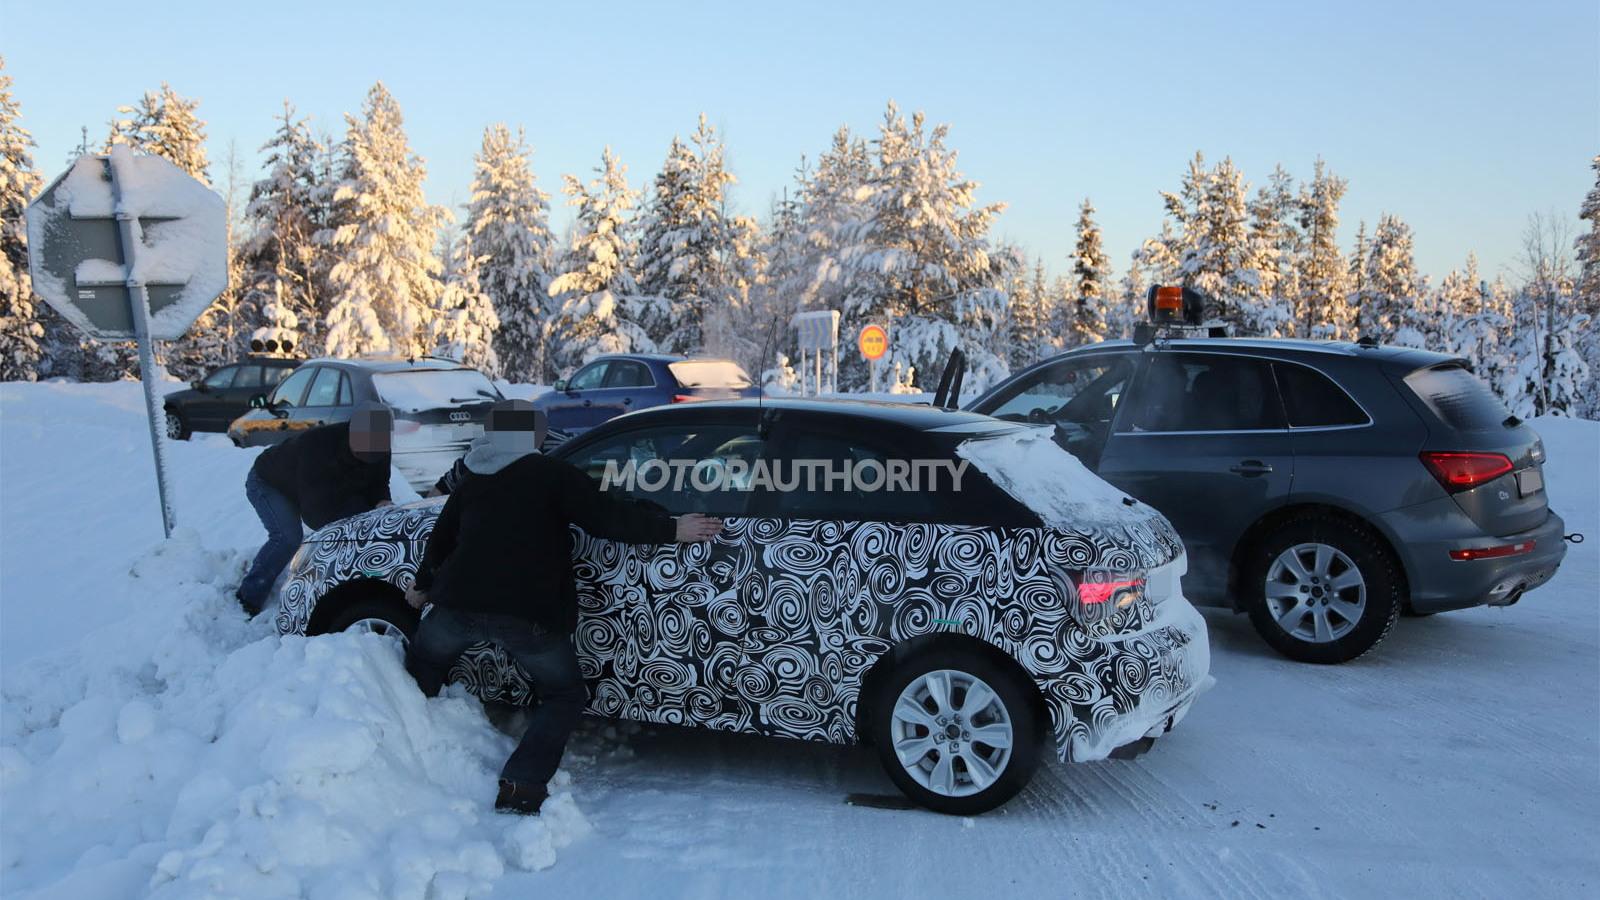 2014 Audi S1 spy shots